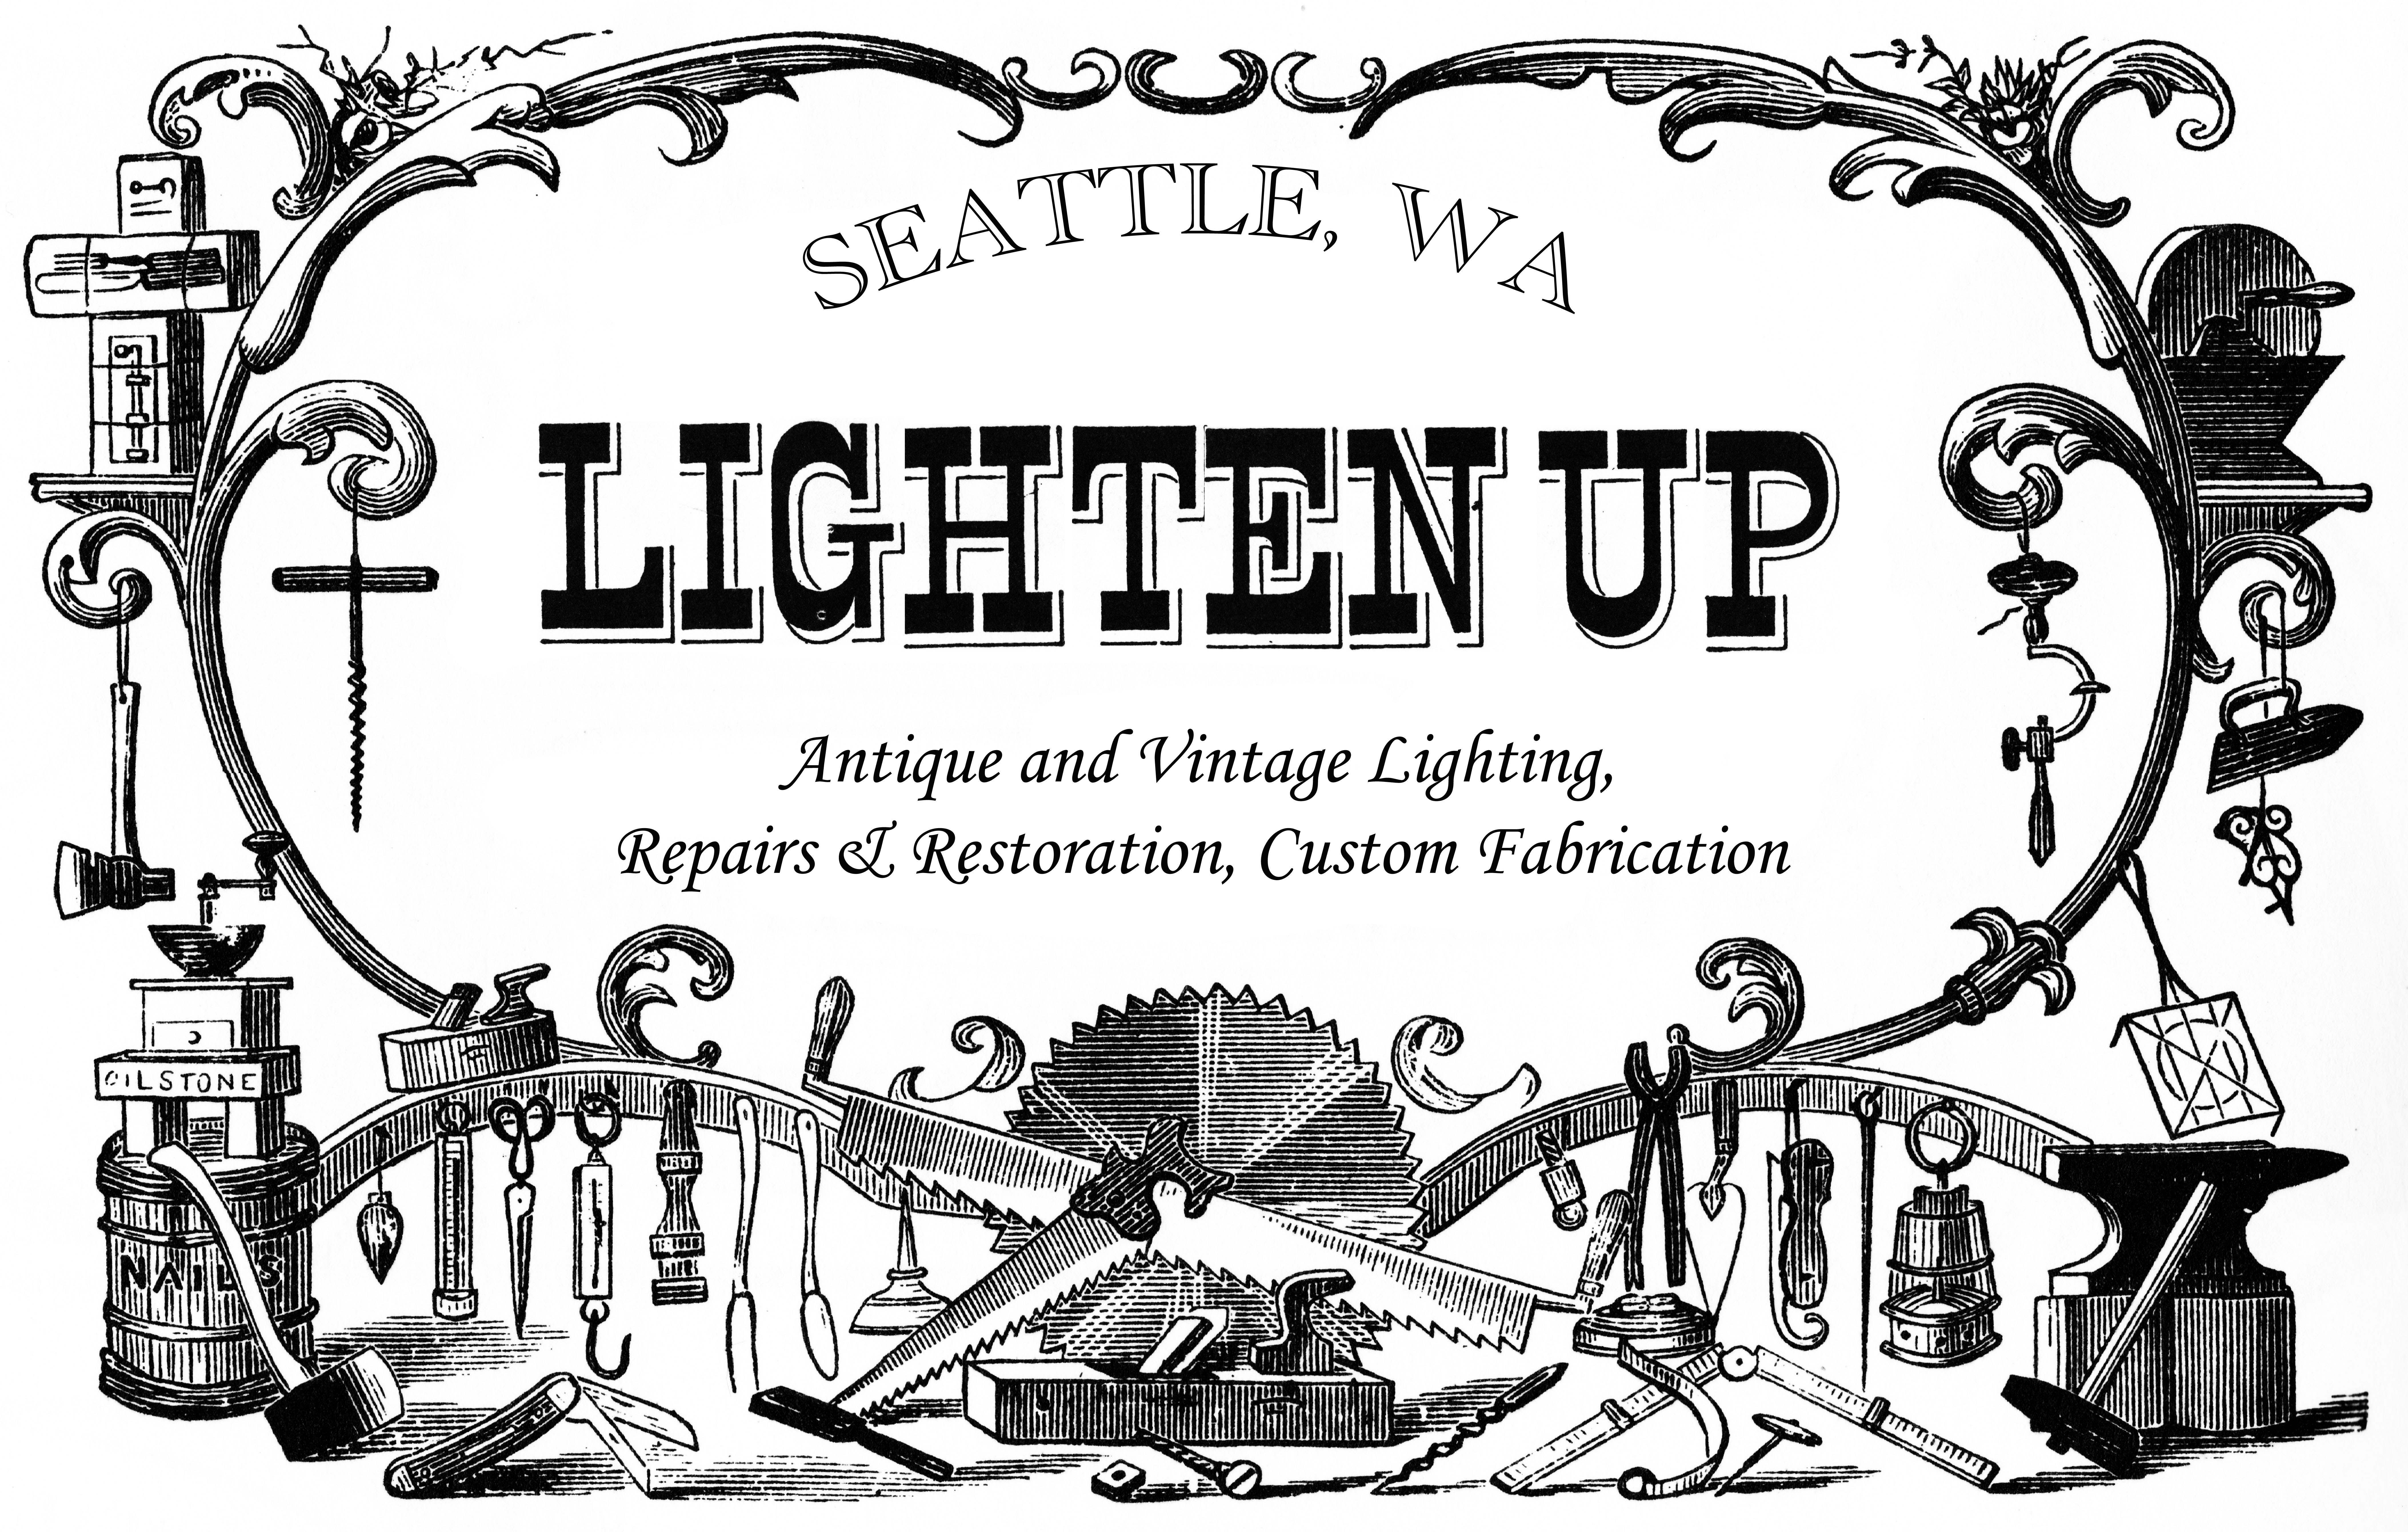 antique  vintage and custom lighting seattle washington